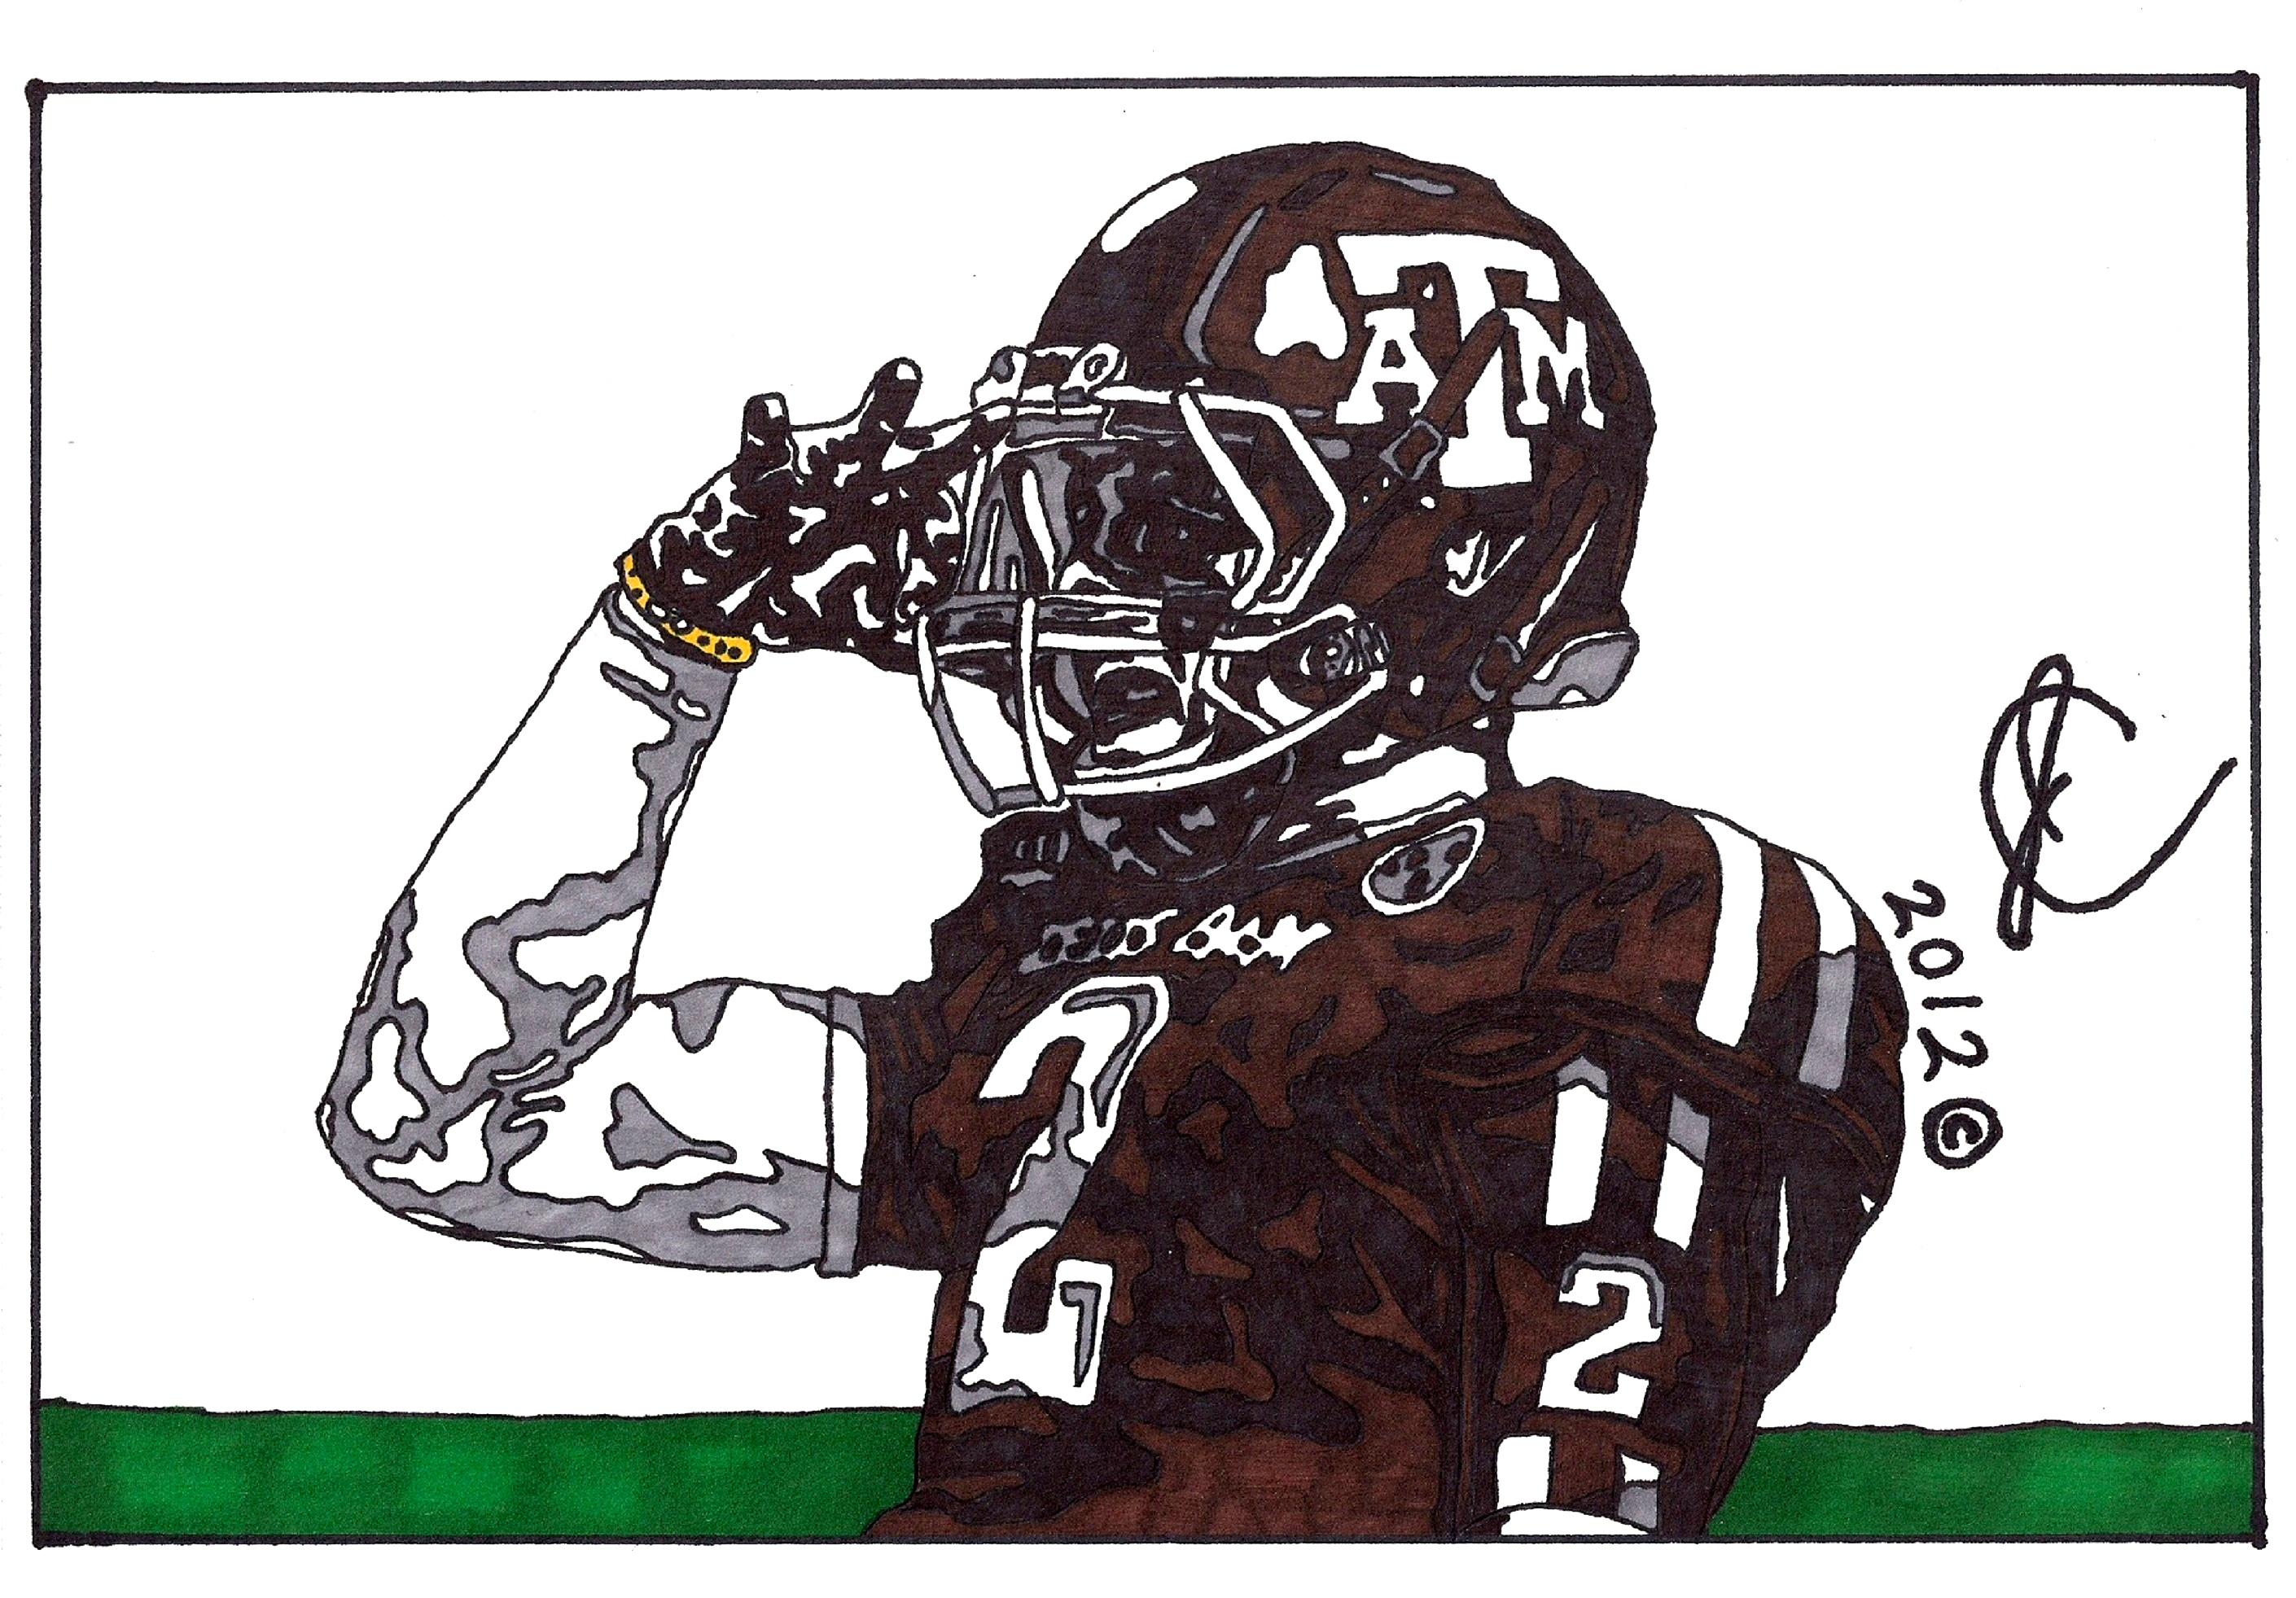 Johnny Manziel Ink Illustration 2 By Jcolley79 On Deviantart